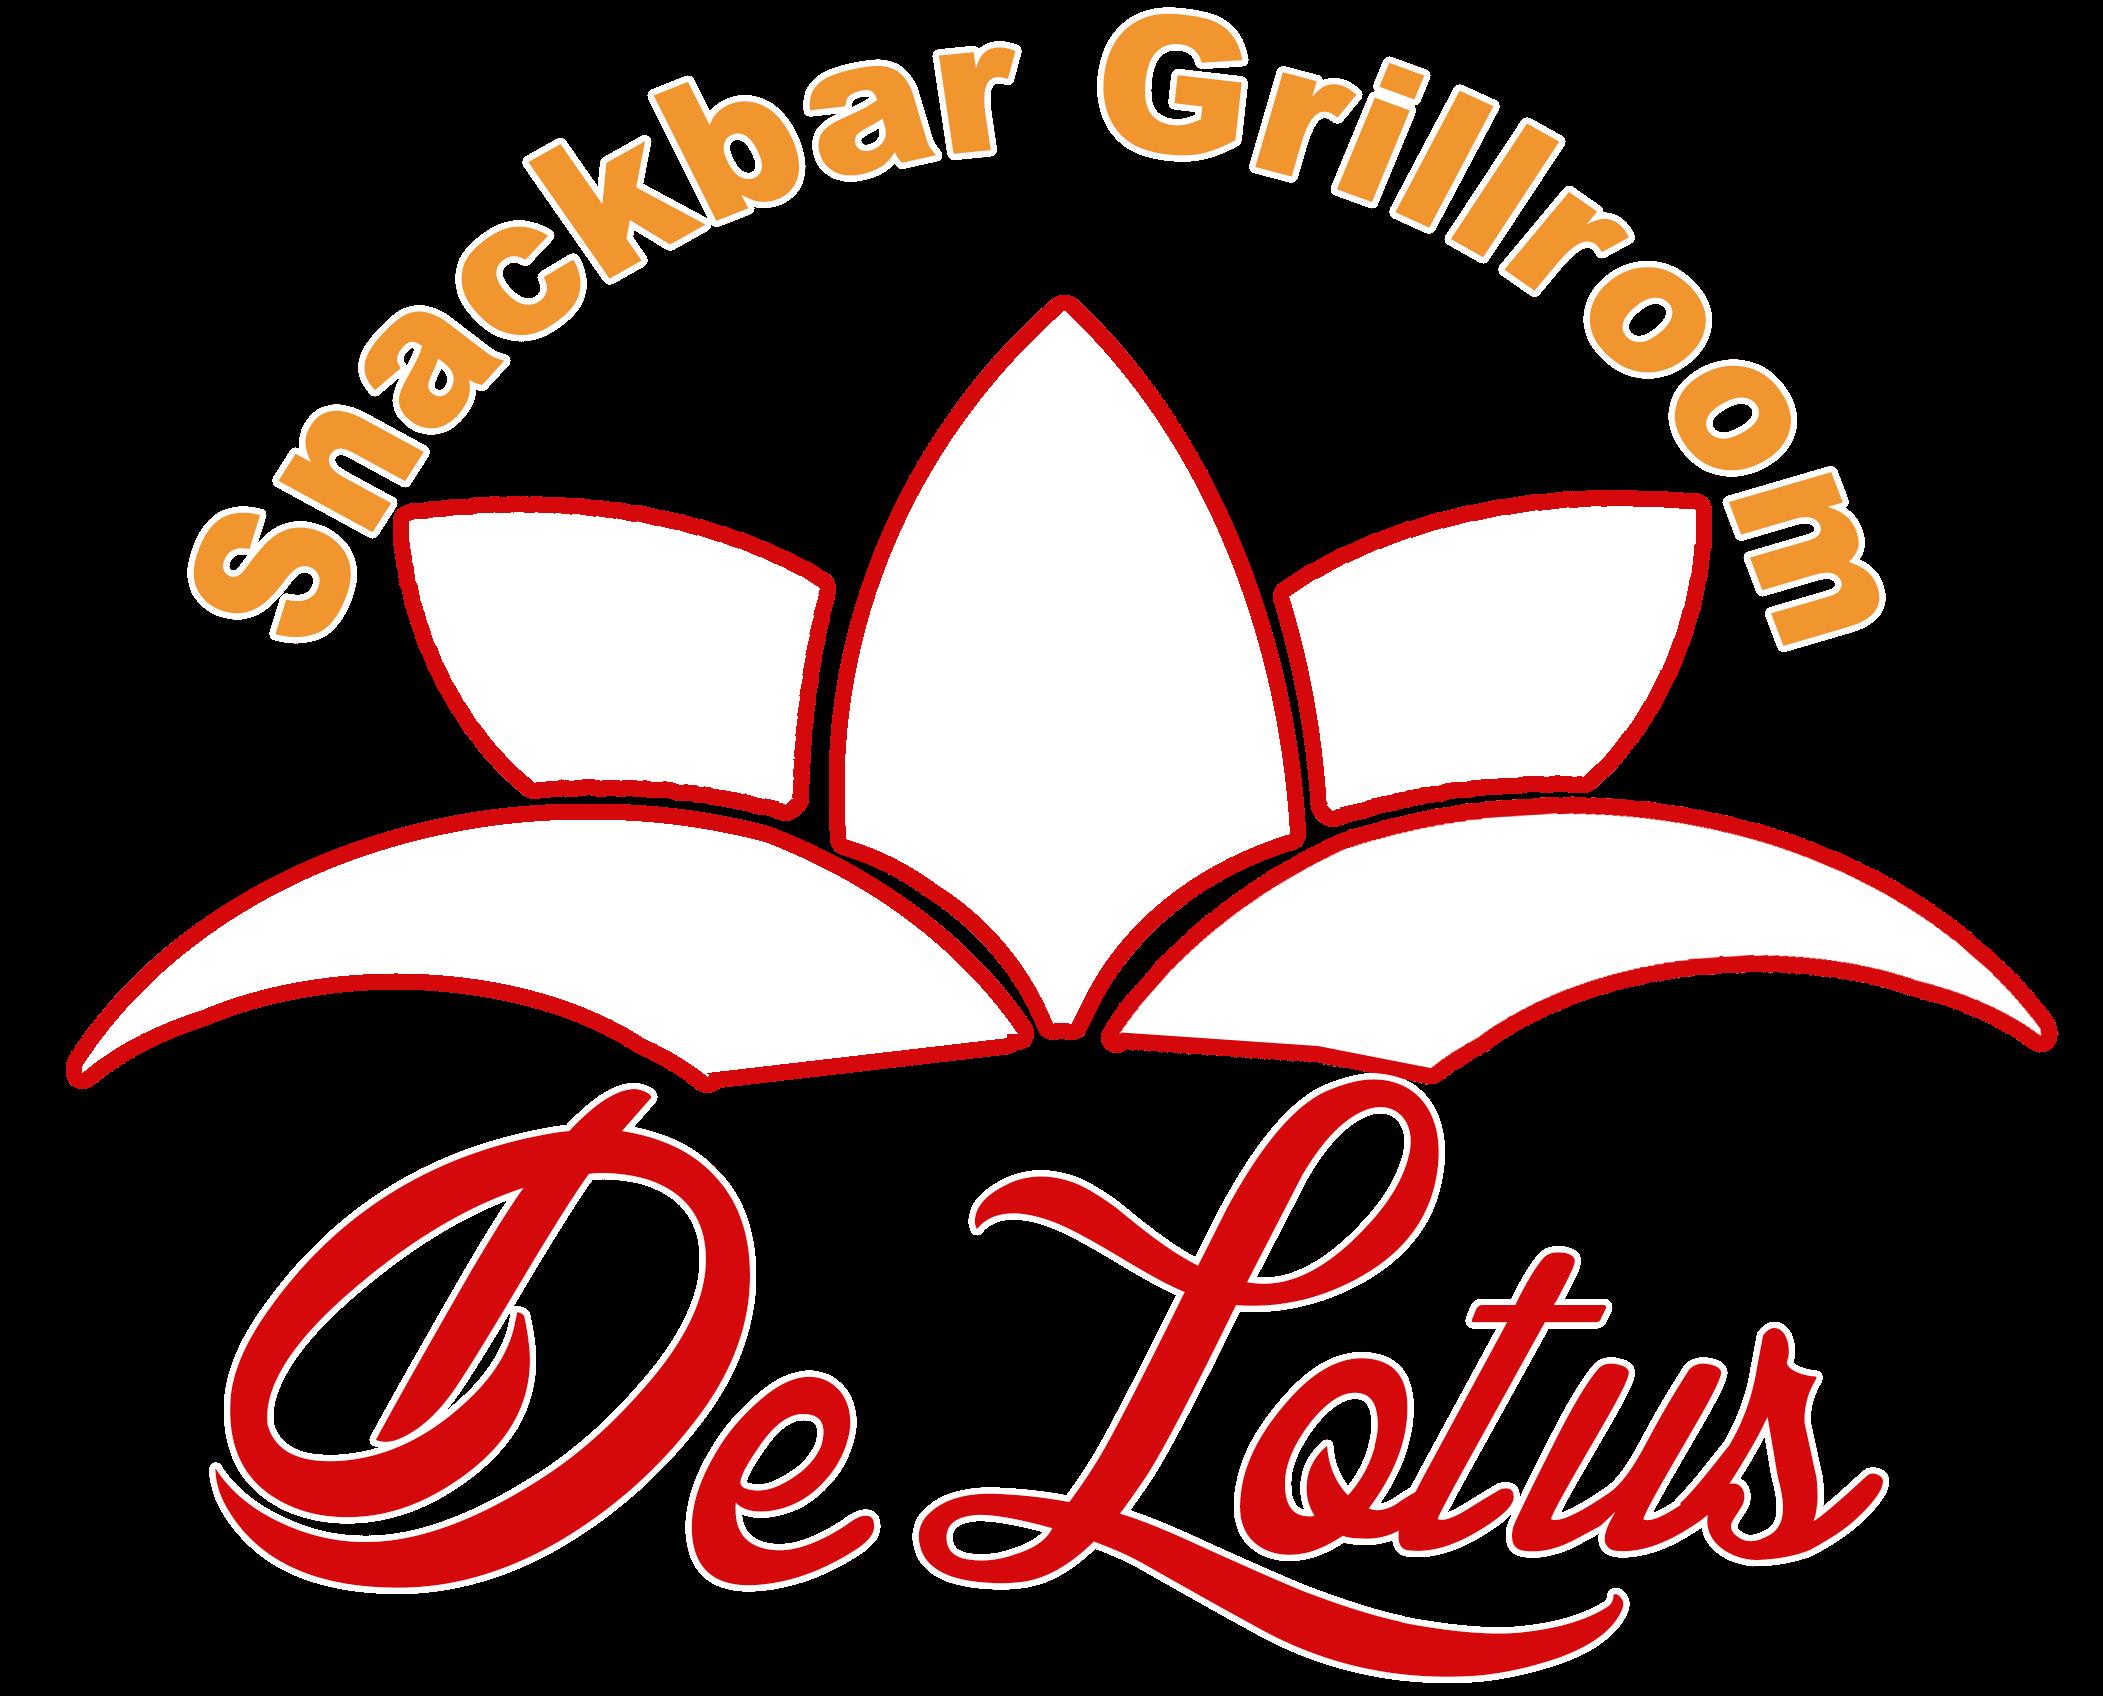 Snackbar en Grillroom Lotus